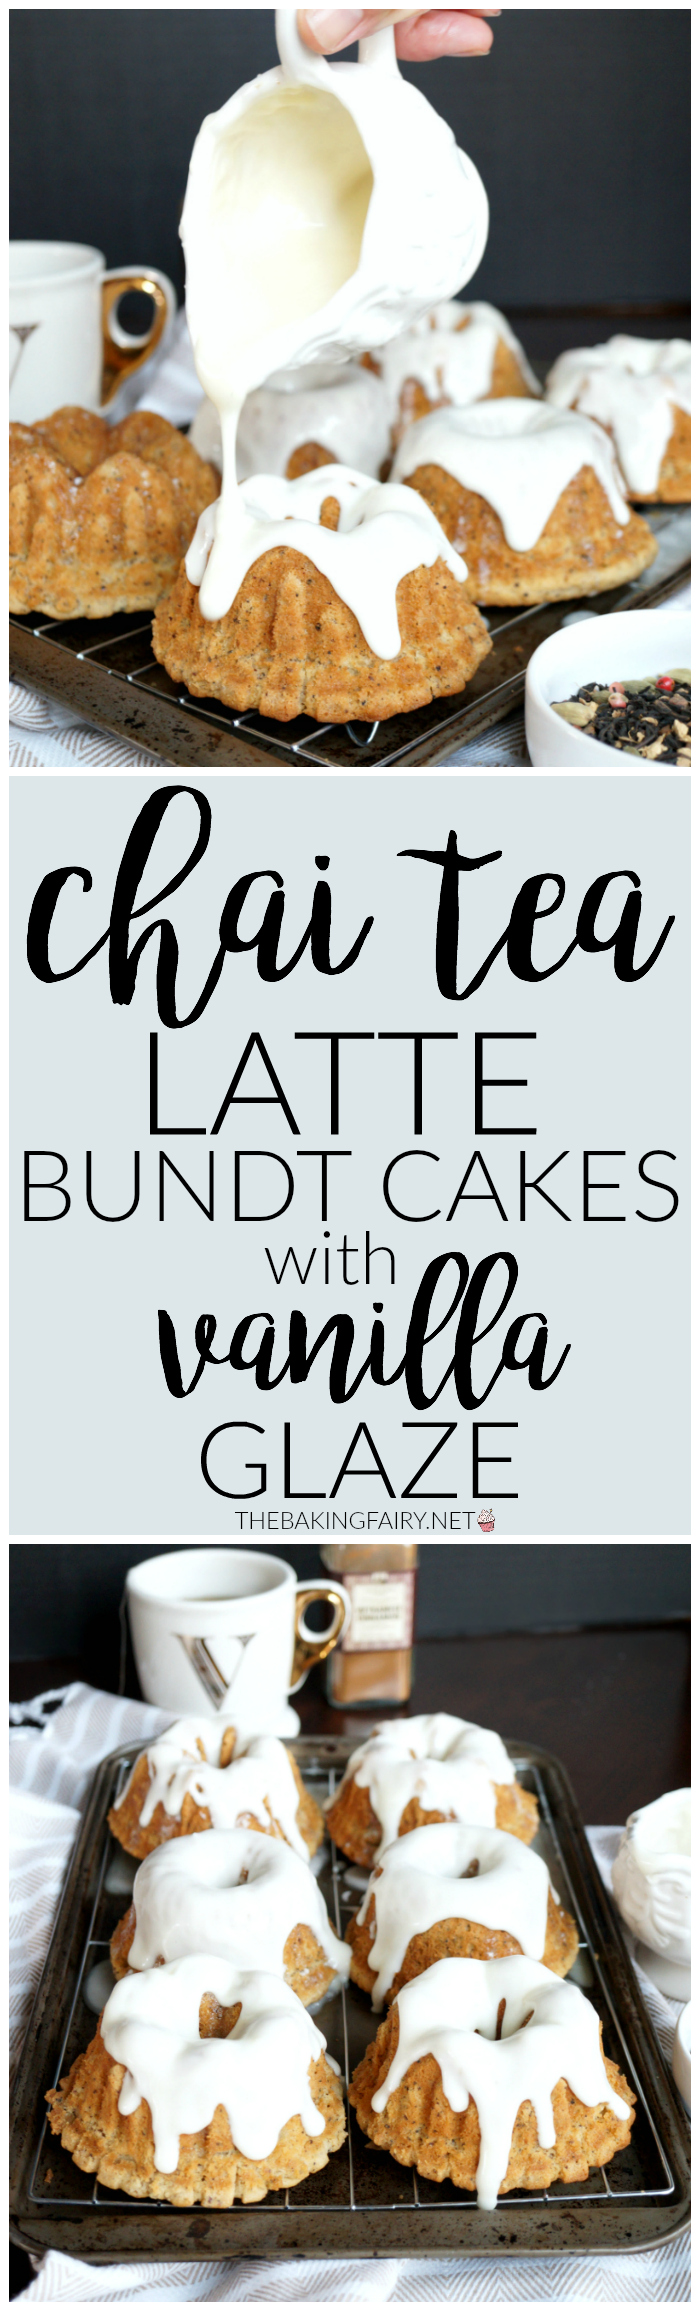 chai tea latte bundt cakes with vanilla glaze | The Baking Fairy